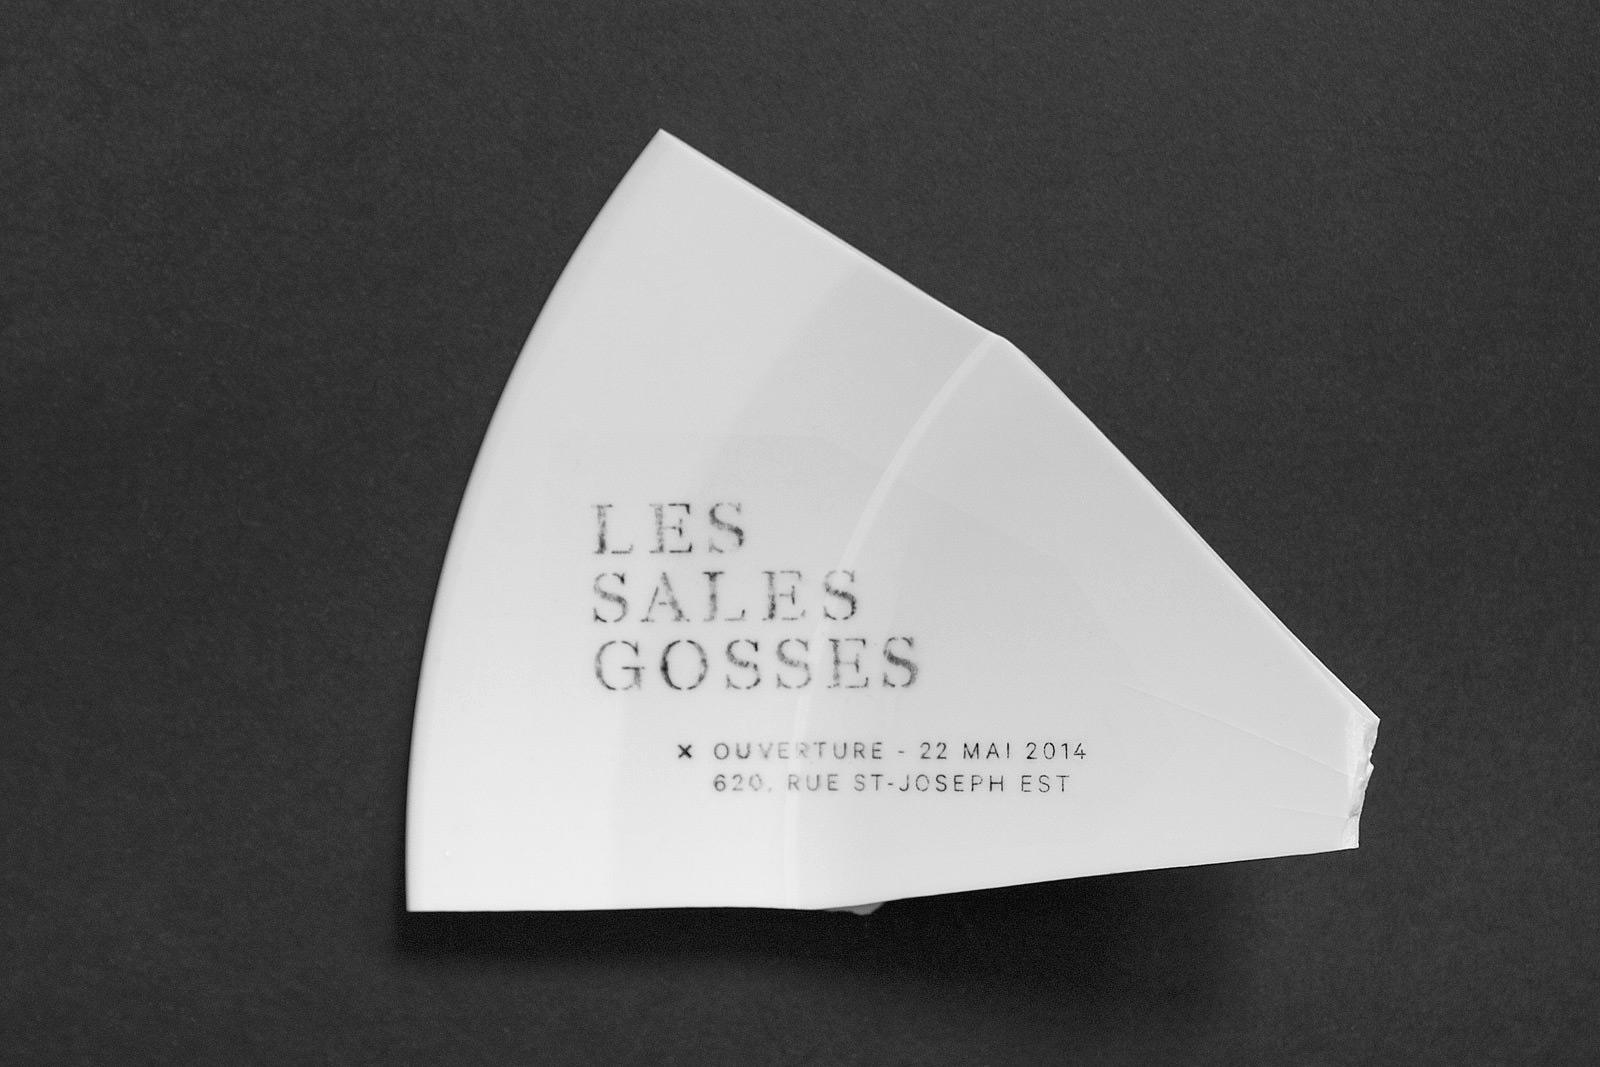 Figure-LesSalesGosses-Restaurant-Logo-Branding-Quebec-Jeremy-Hall-17.jpg